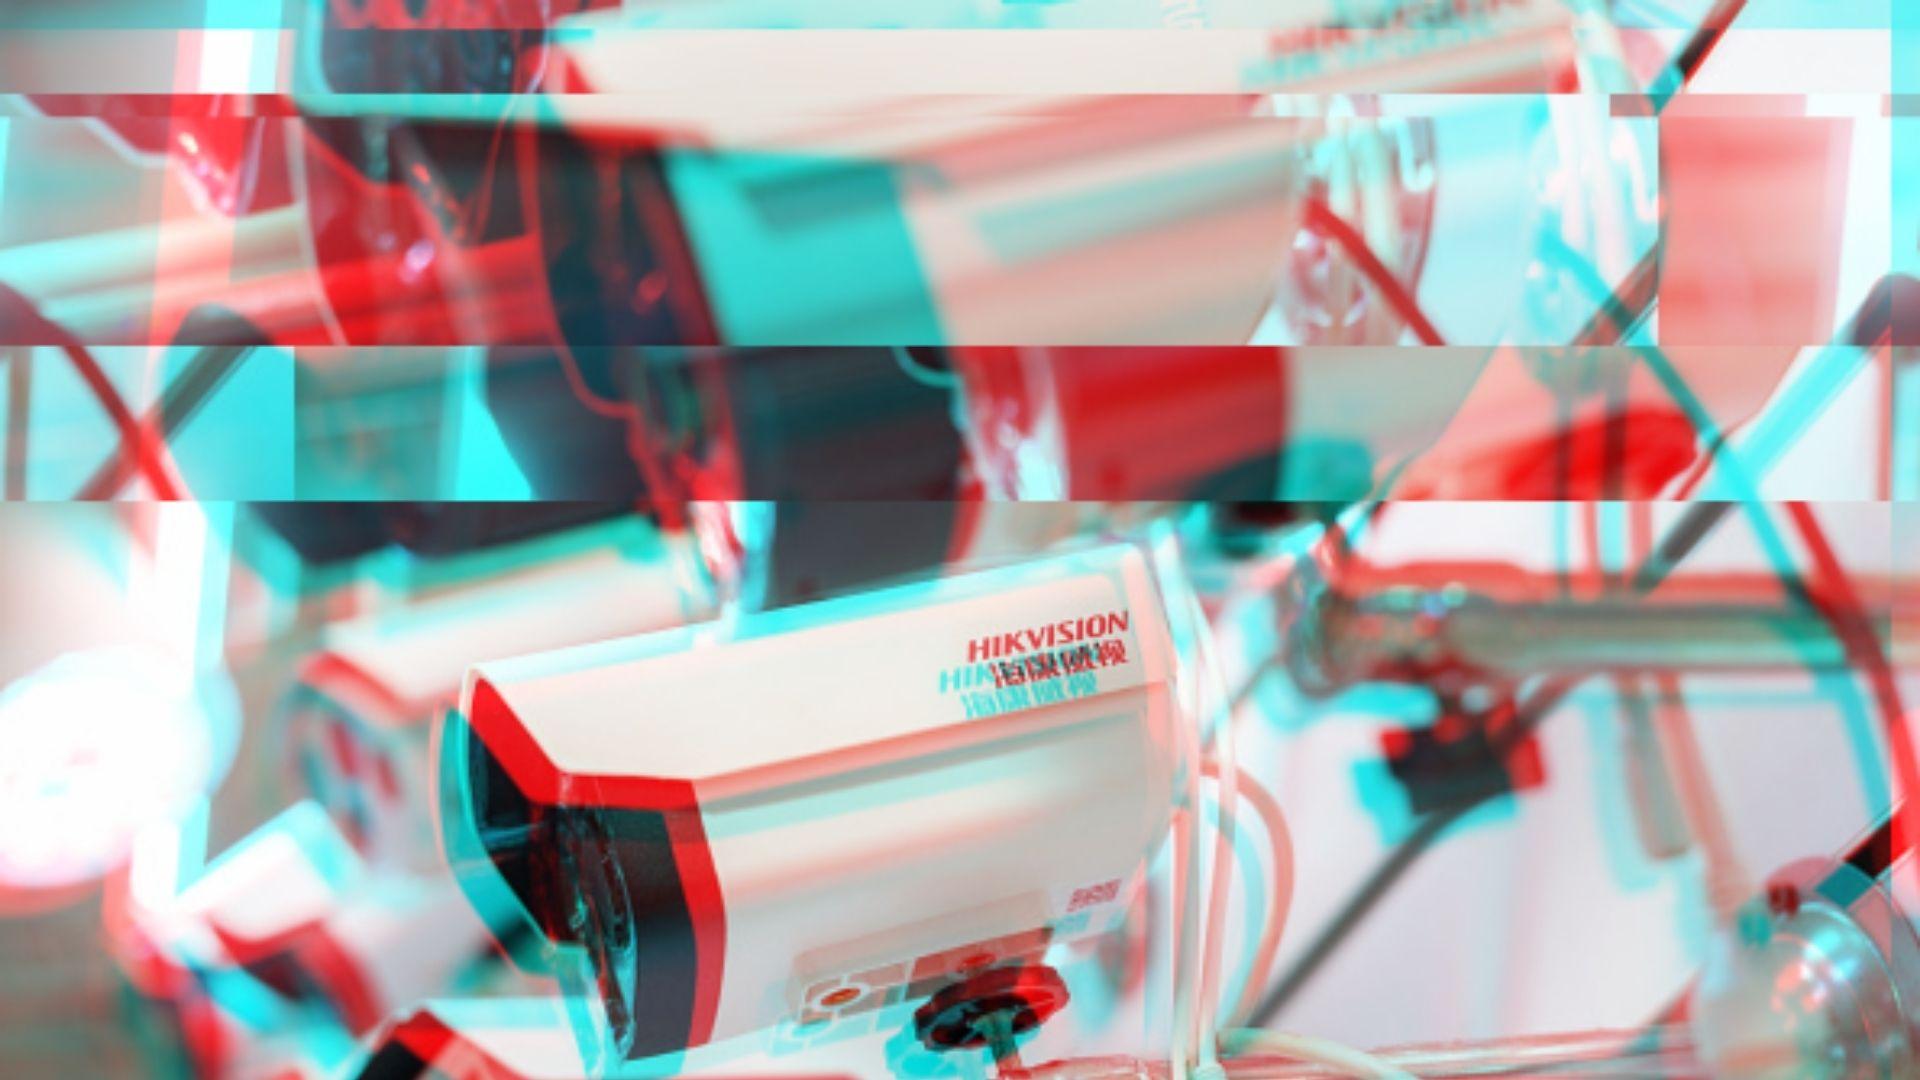 Security storm over Matt Hancock CCTV footage involves Chinese tech giant Hikvision – Coda Story